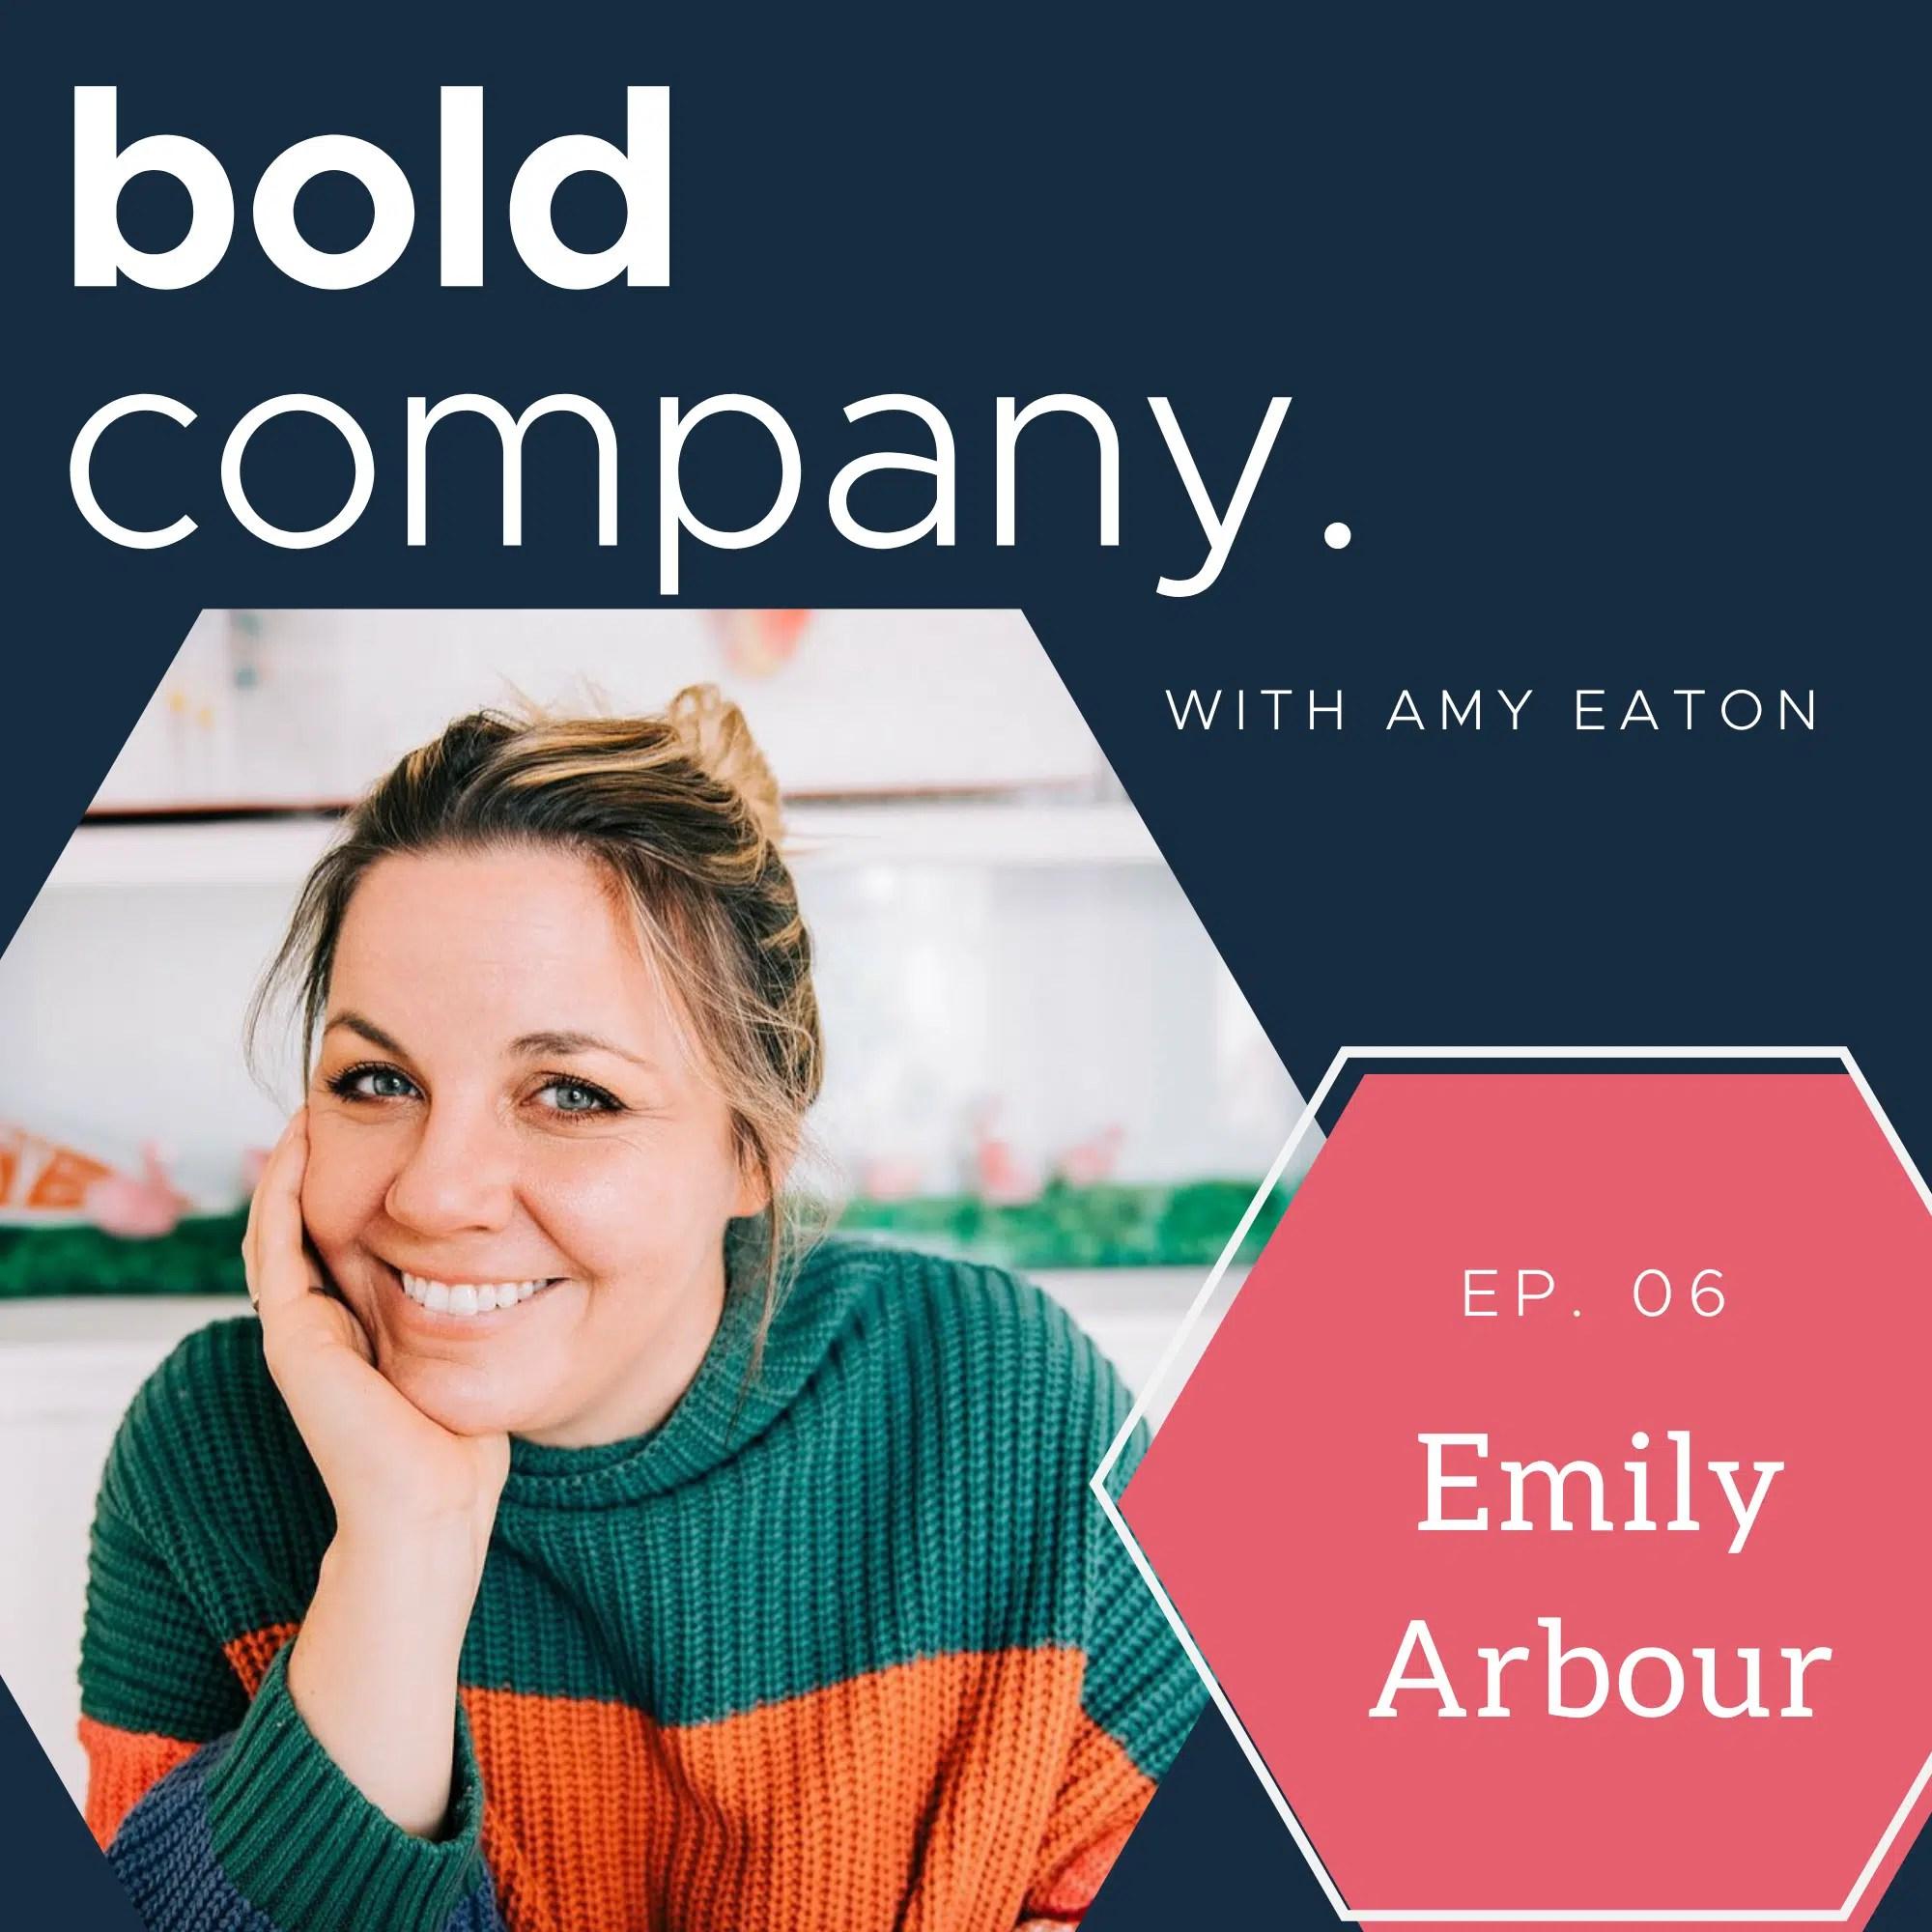 Bold Company Episode 6 – Emily Arbour